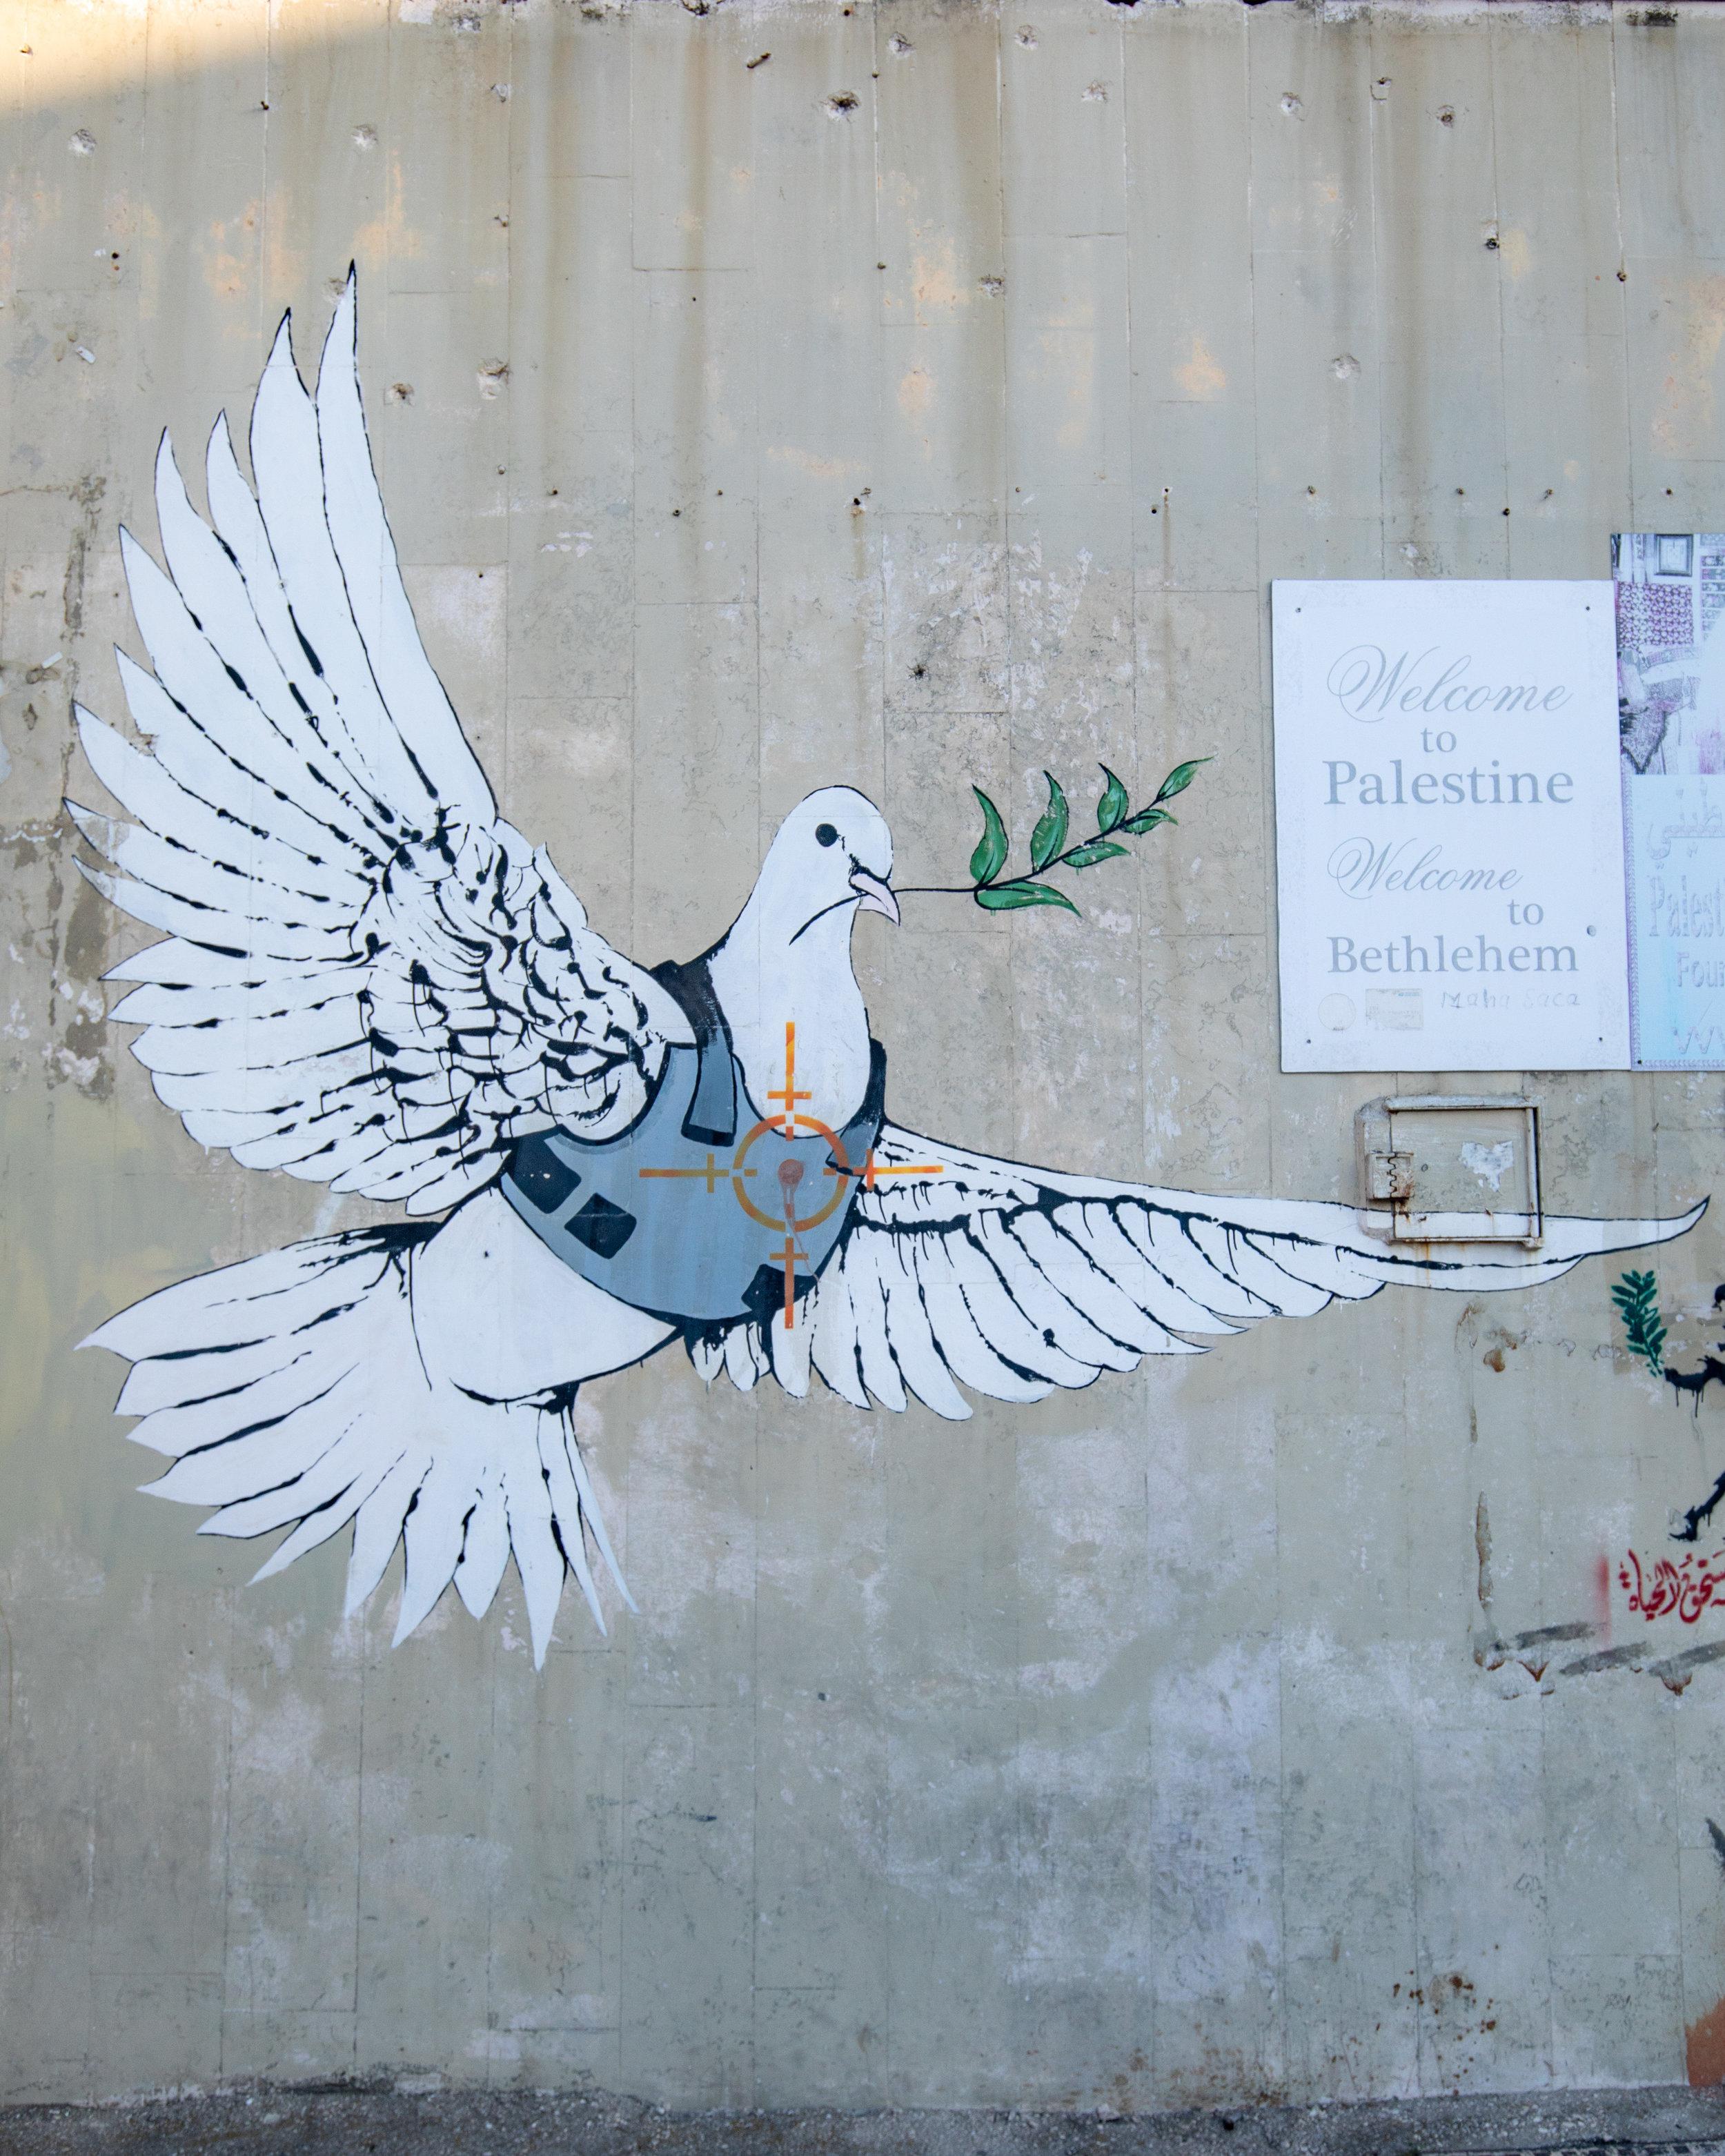 Banksy Art in Bethlehem